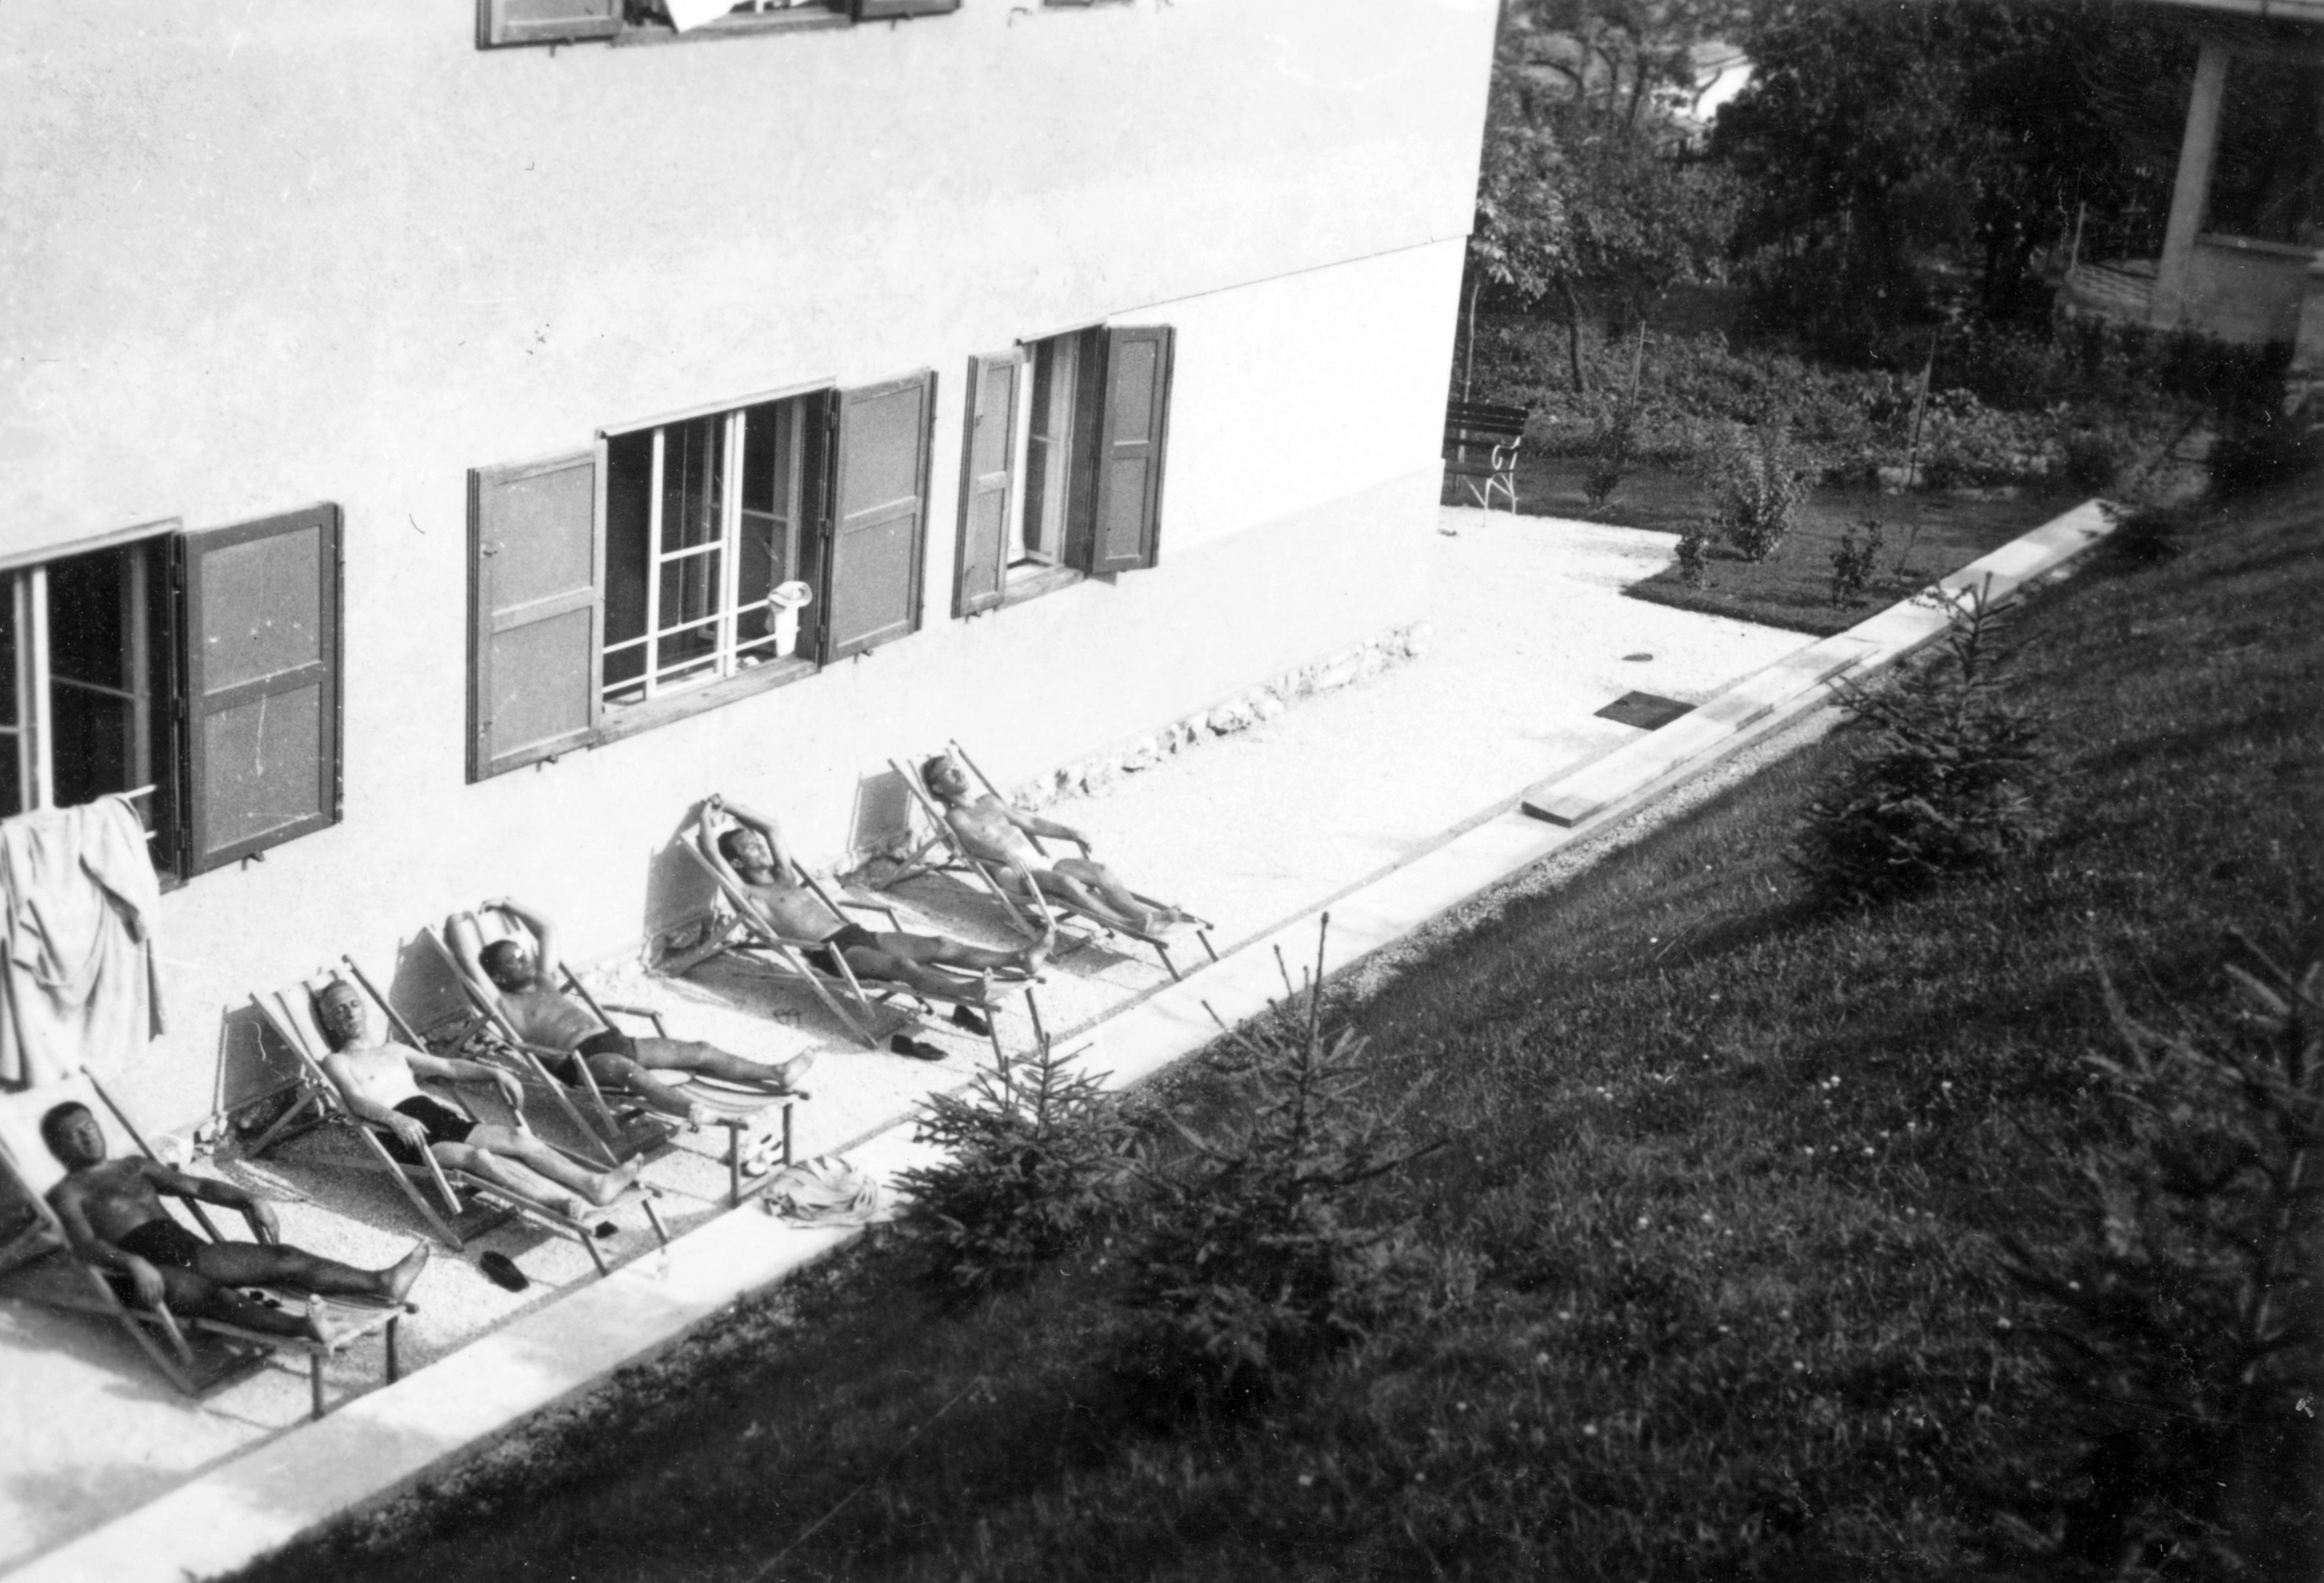 Sunbathe, deck chair, men, bathing suit Fortepan 16139.jpg Tags: sunbathe, deck chair, men, bathing suit Date 1937 Source http://www.fortepan